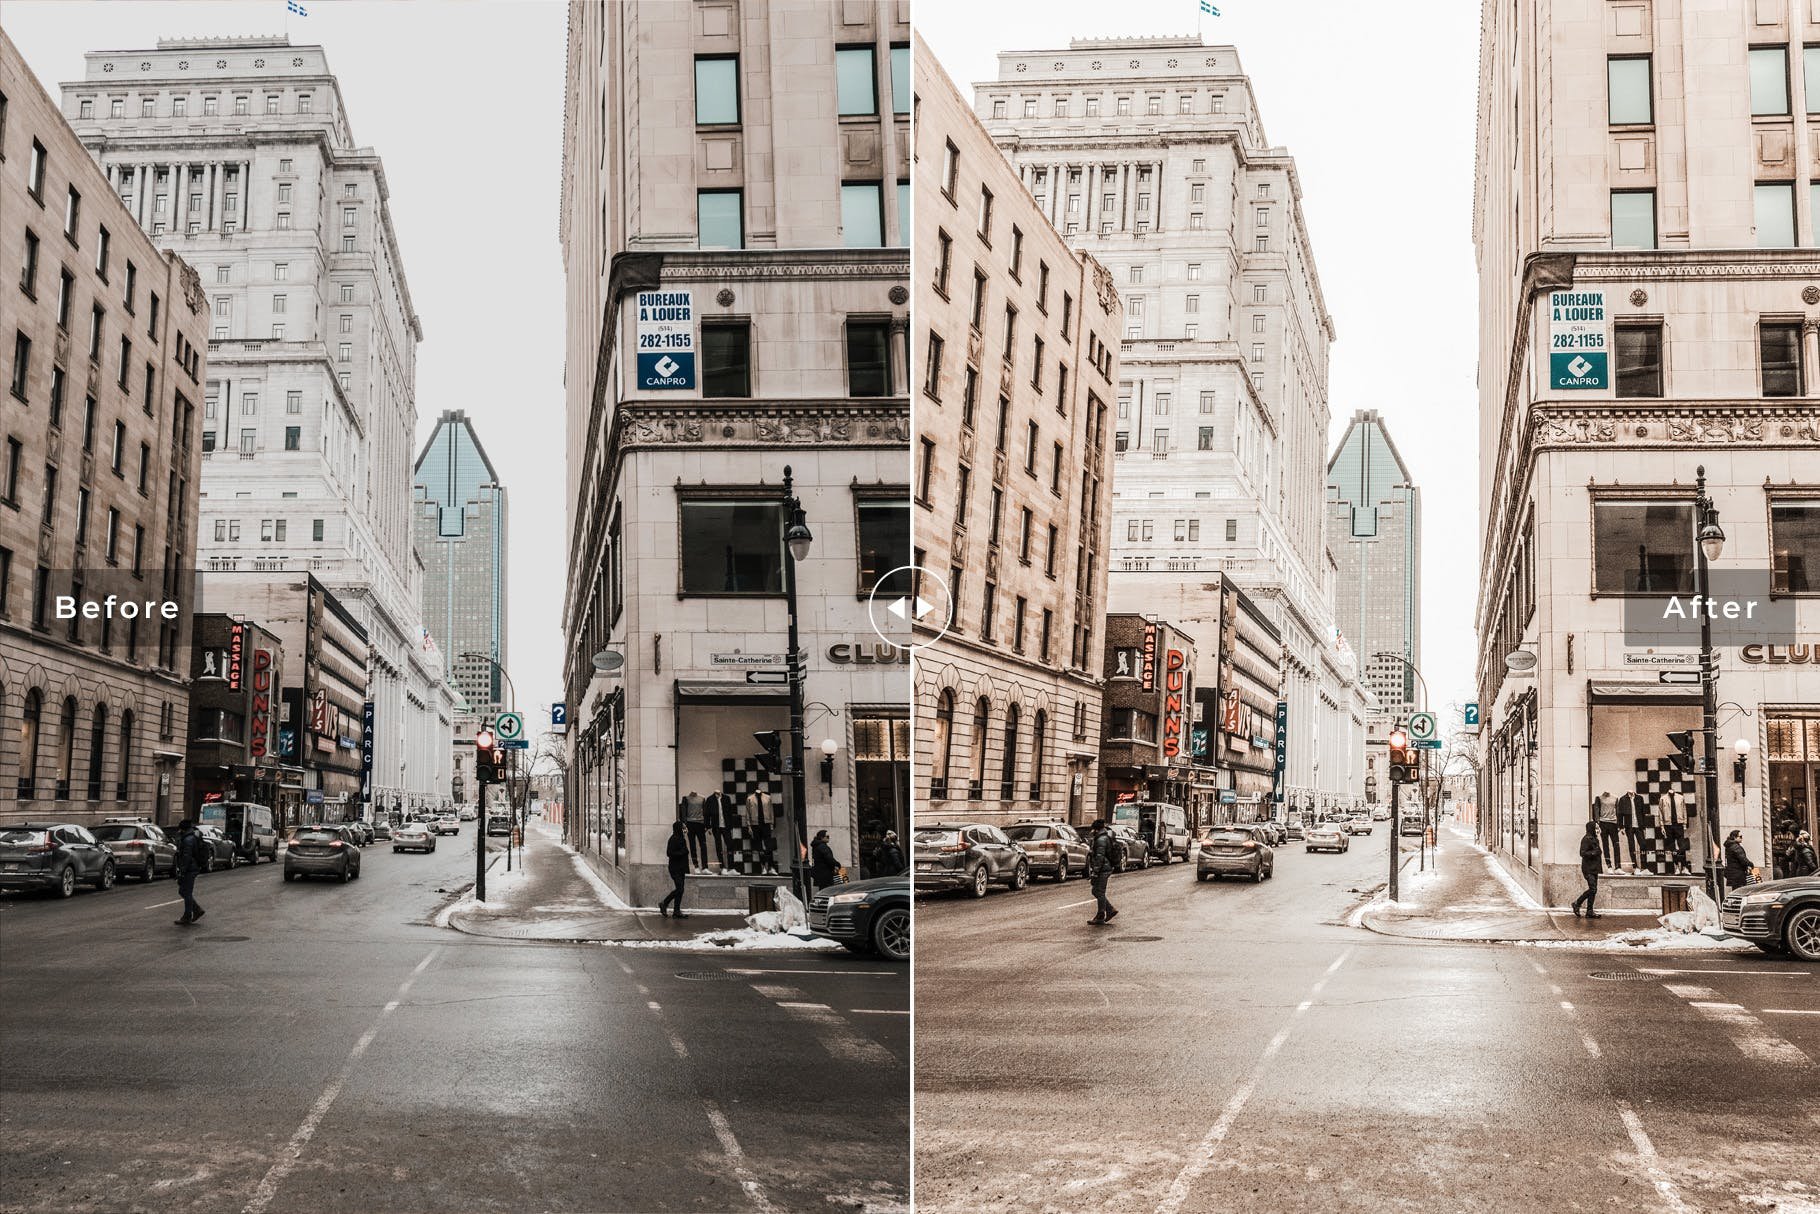 旅行摄影专业调色Lightroom预设下载 Montreal Mobile & Desktop Lightroom Presets设计素材模板